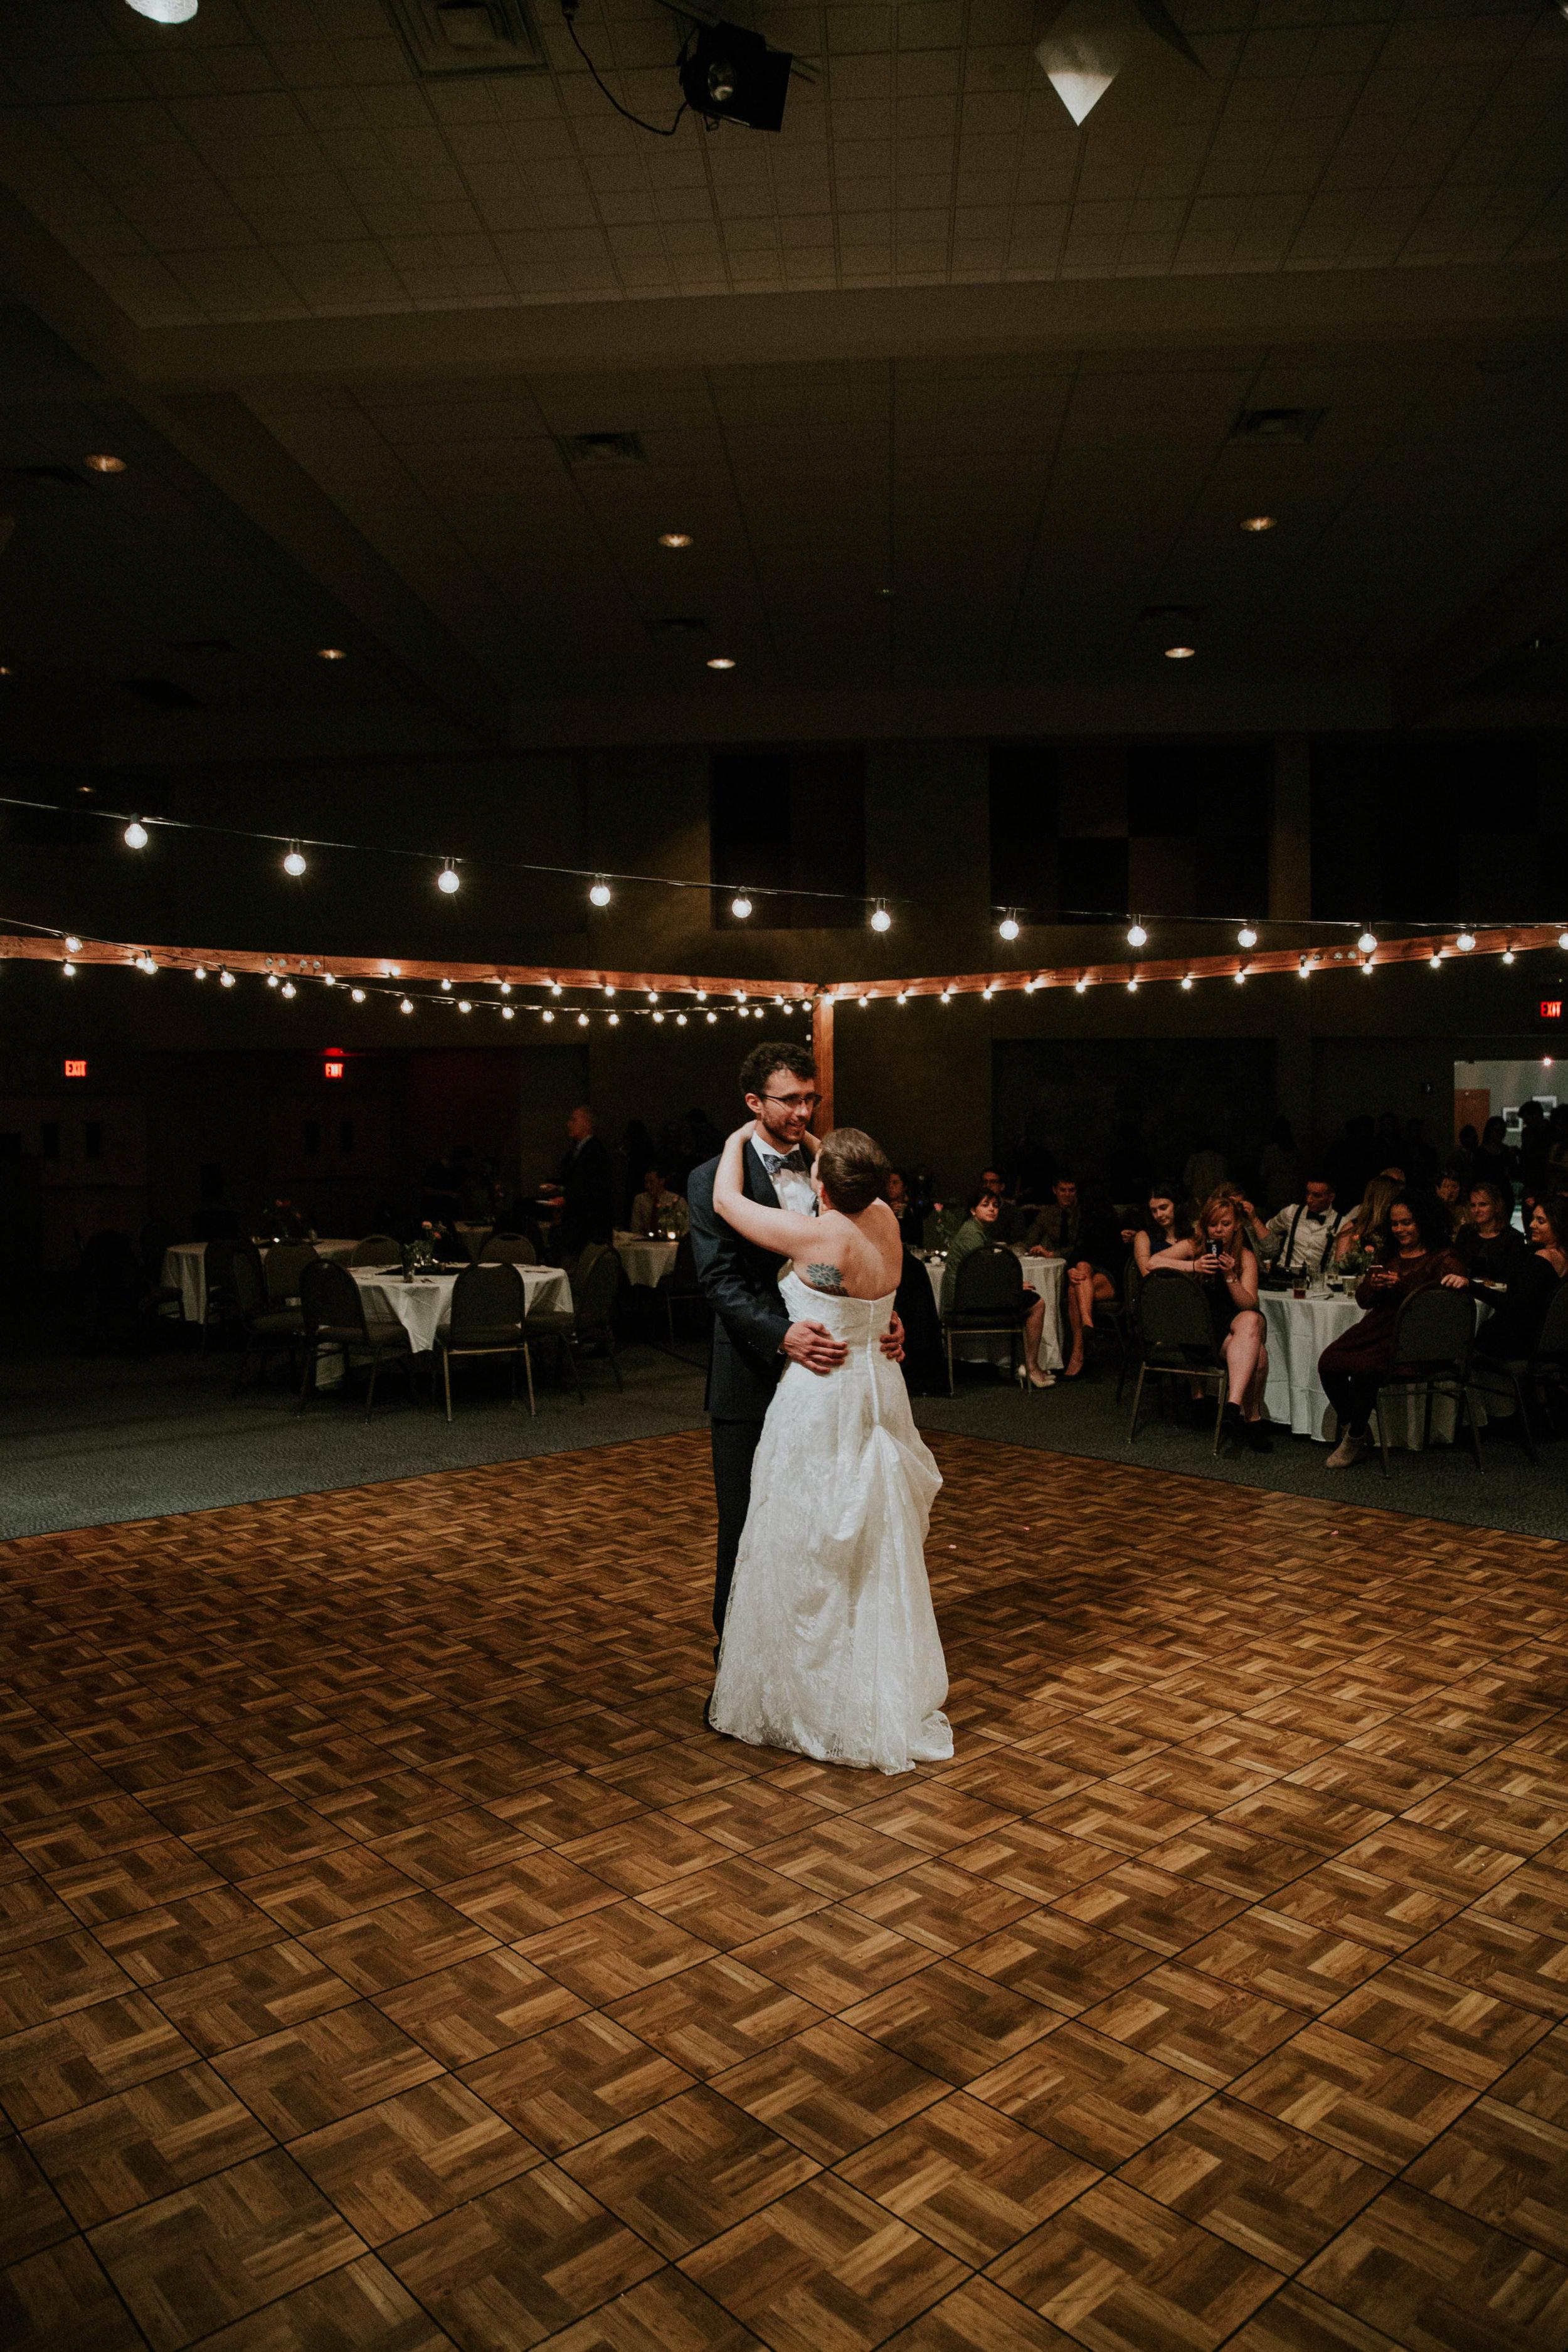 Columbus ohio wedding photographer grace e jones photography real fun joyful wedding131.jpg